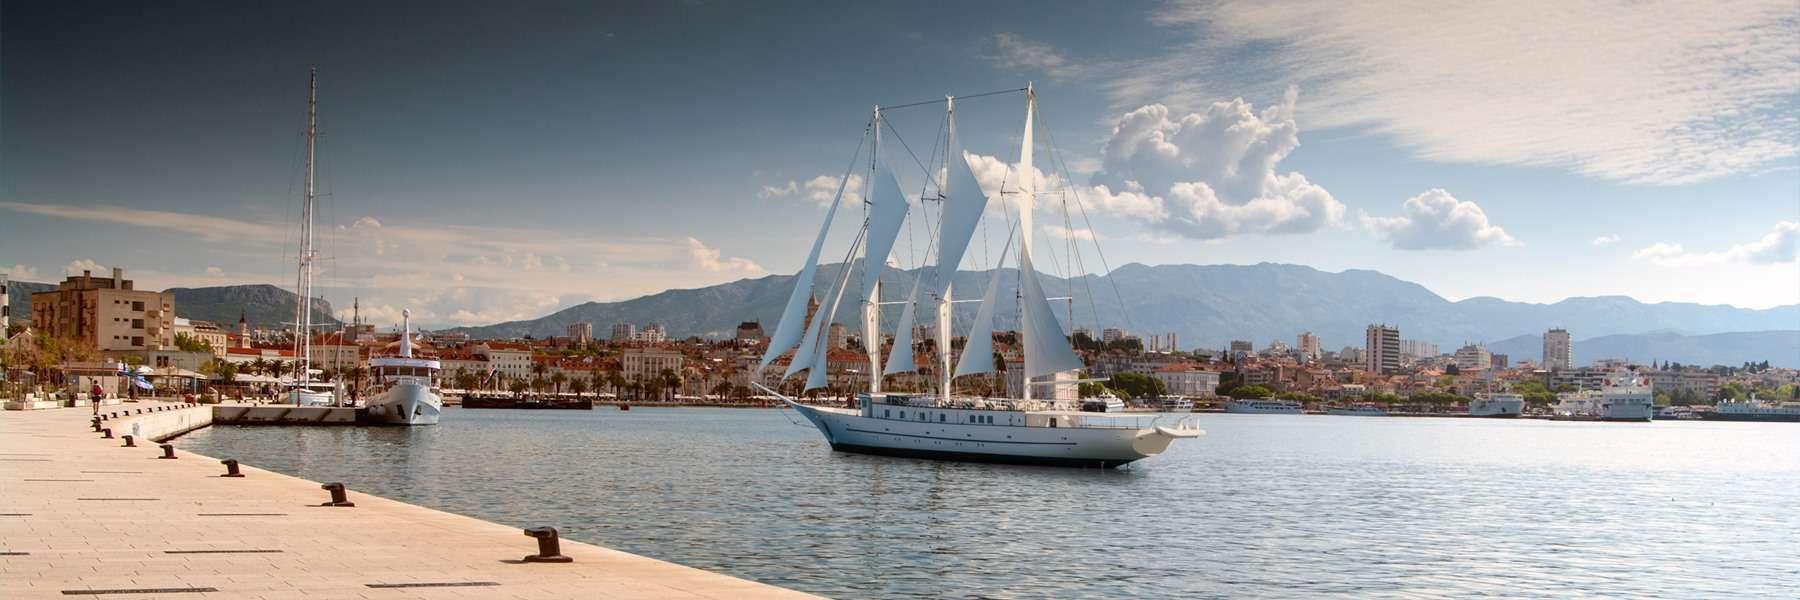 MY Klara, Cruise ship, Croatia